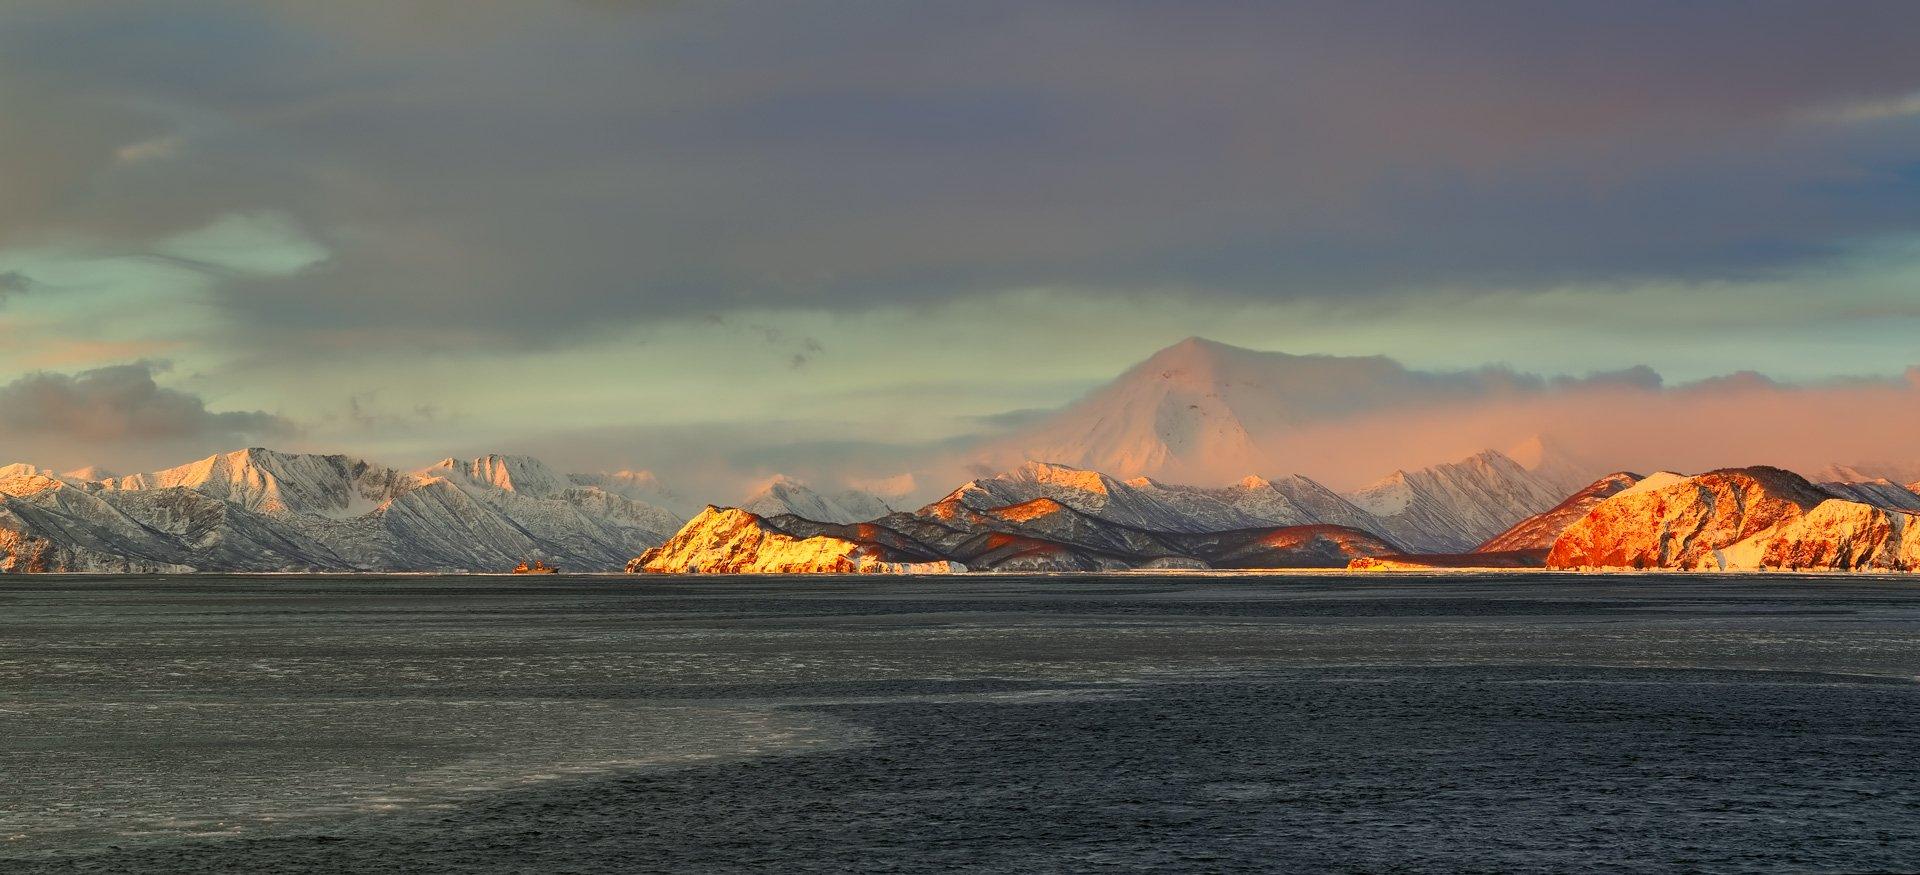 берег, вечер, зима, камчатка, рейд, судно, утро, циклон, Евгений Паршуков